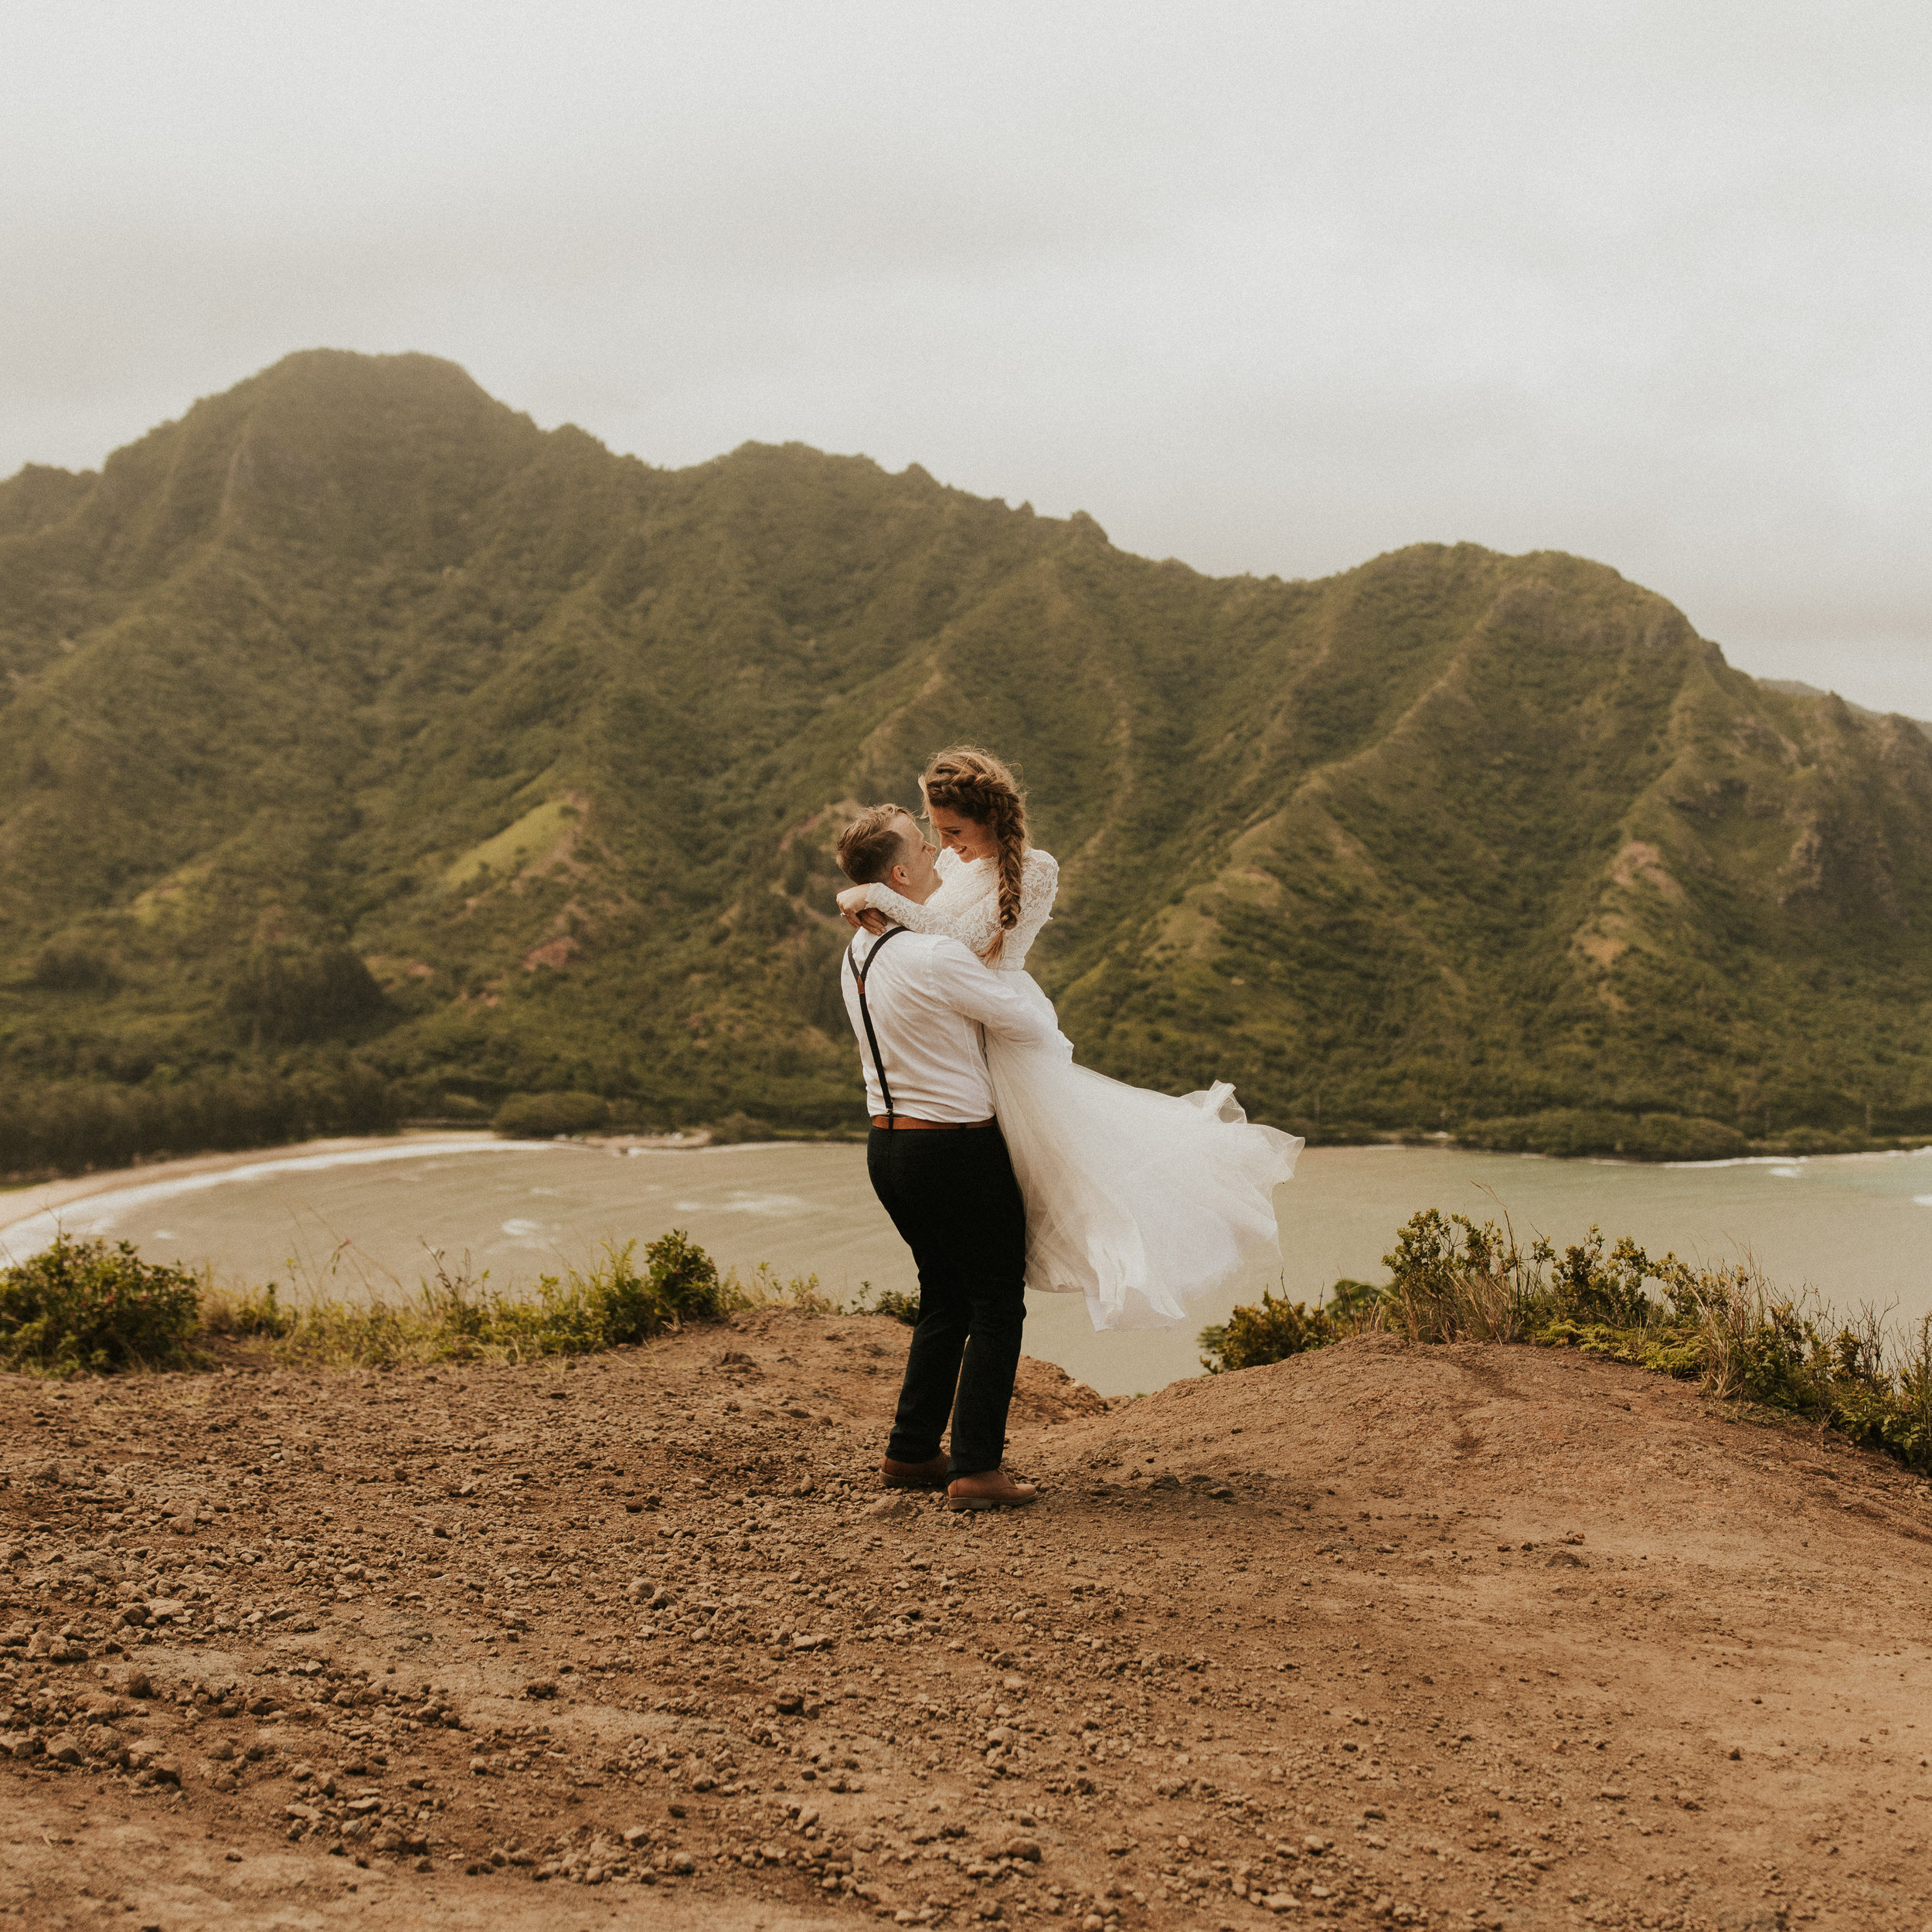 the-mclachlans-destination-elopement-photographers-mountain-hike-sena-eric-35.jpg